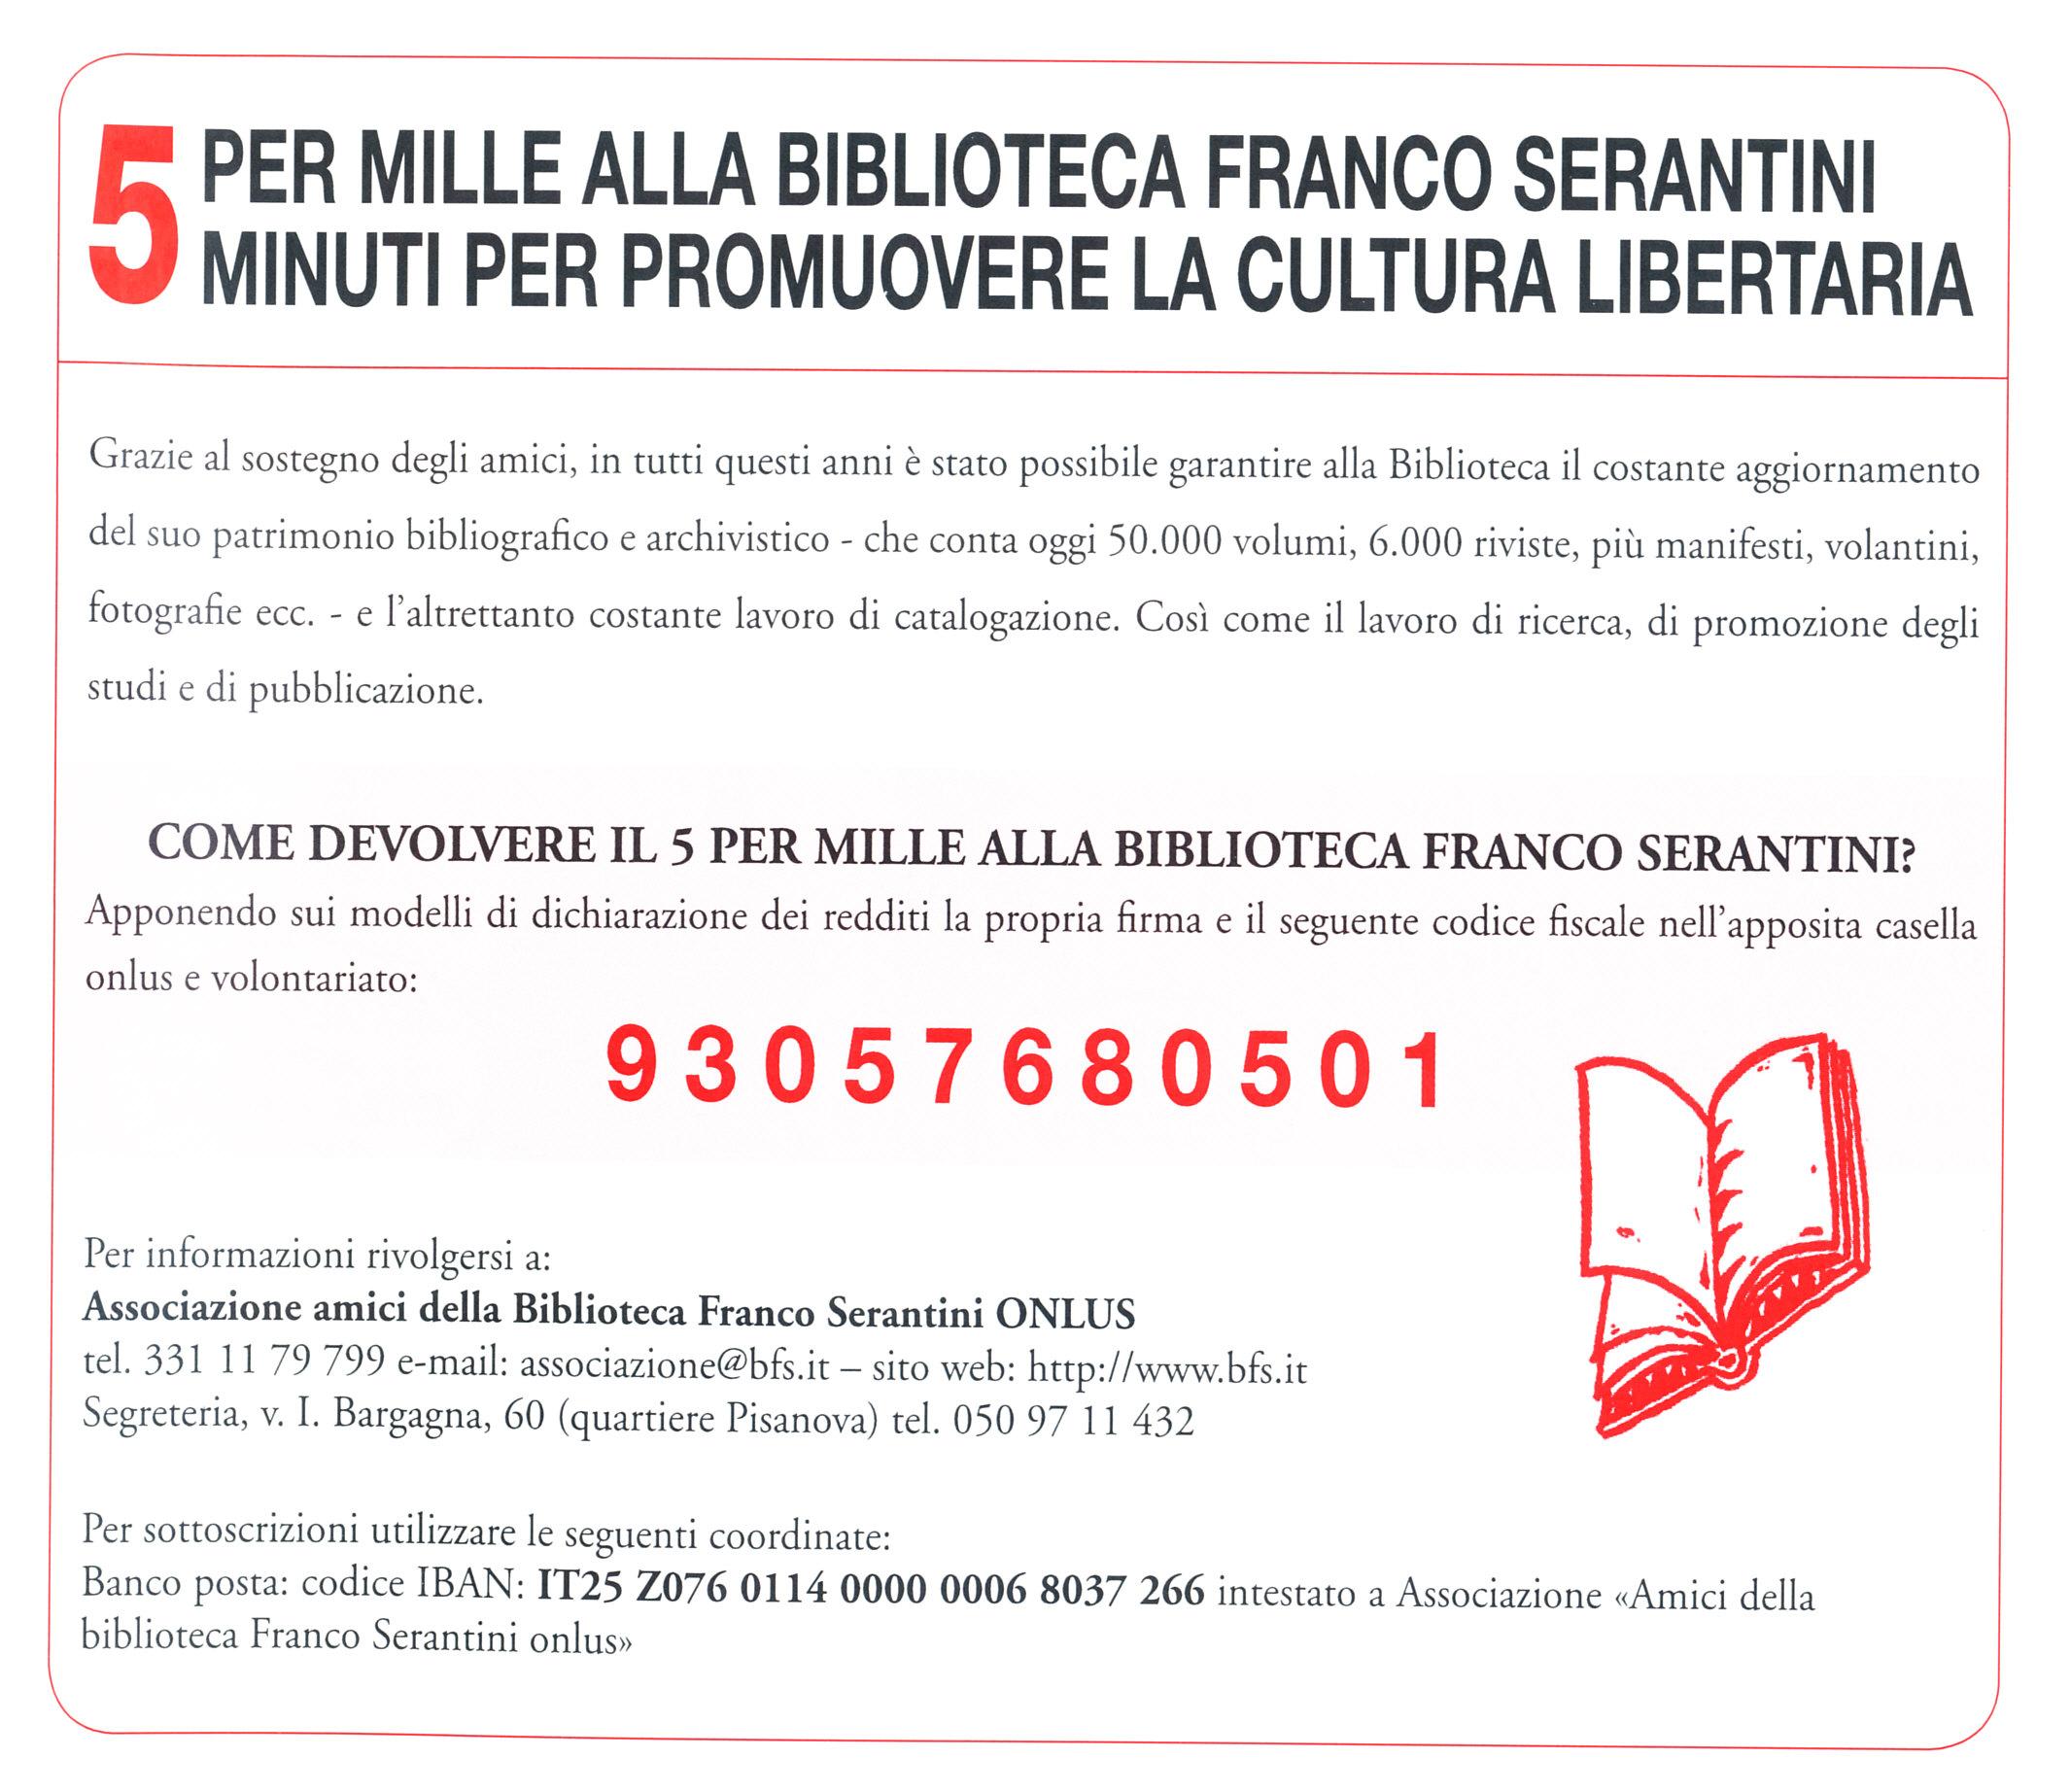 5xmille alla Biblioteca Franco Serantini